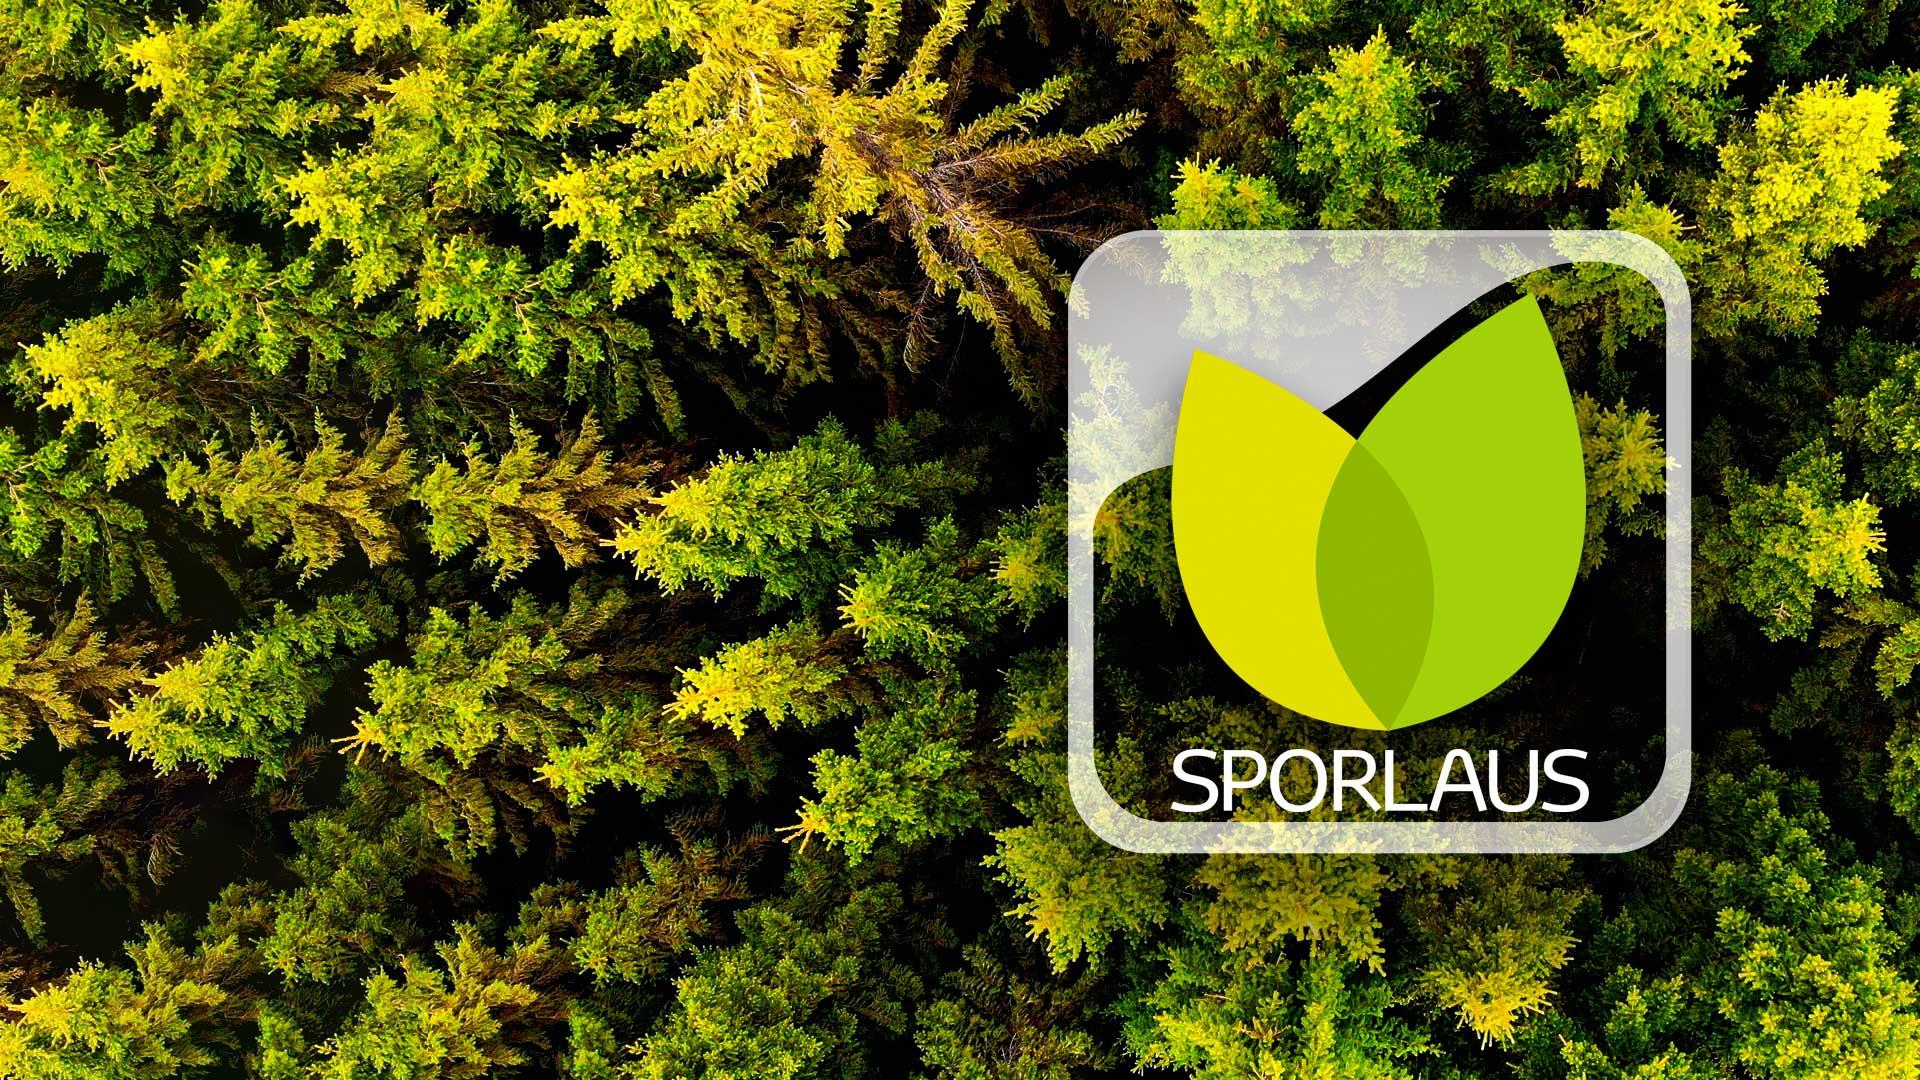 Sporlaus 1920x1080 03